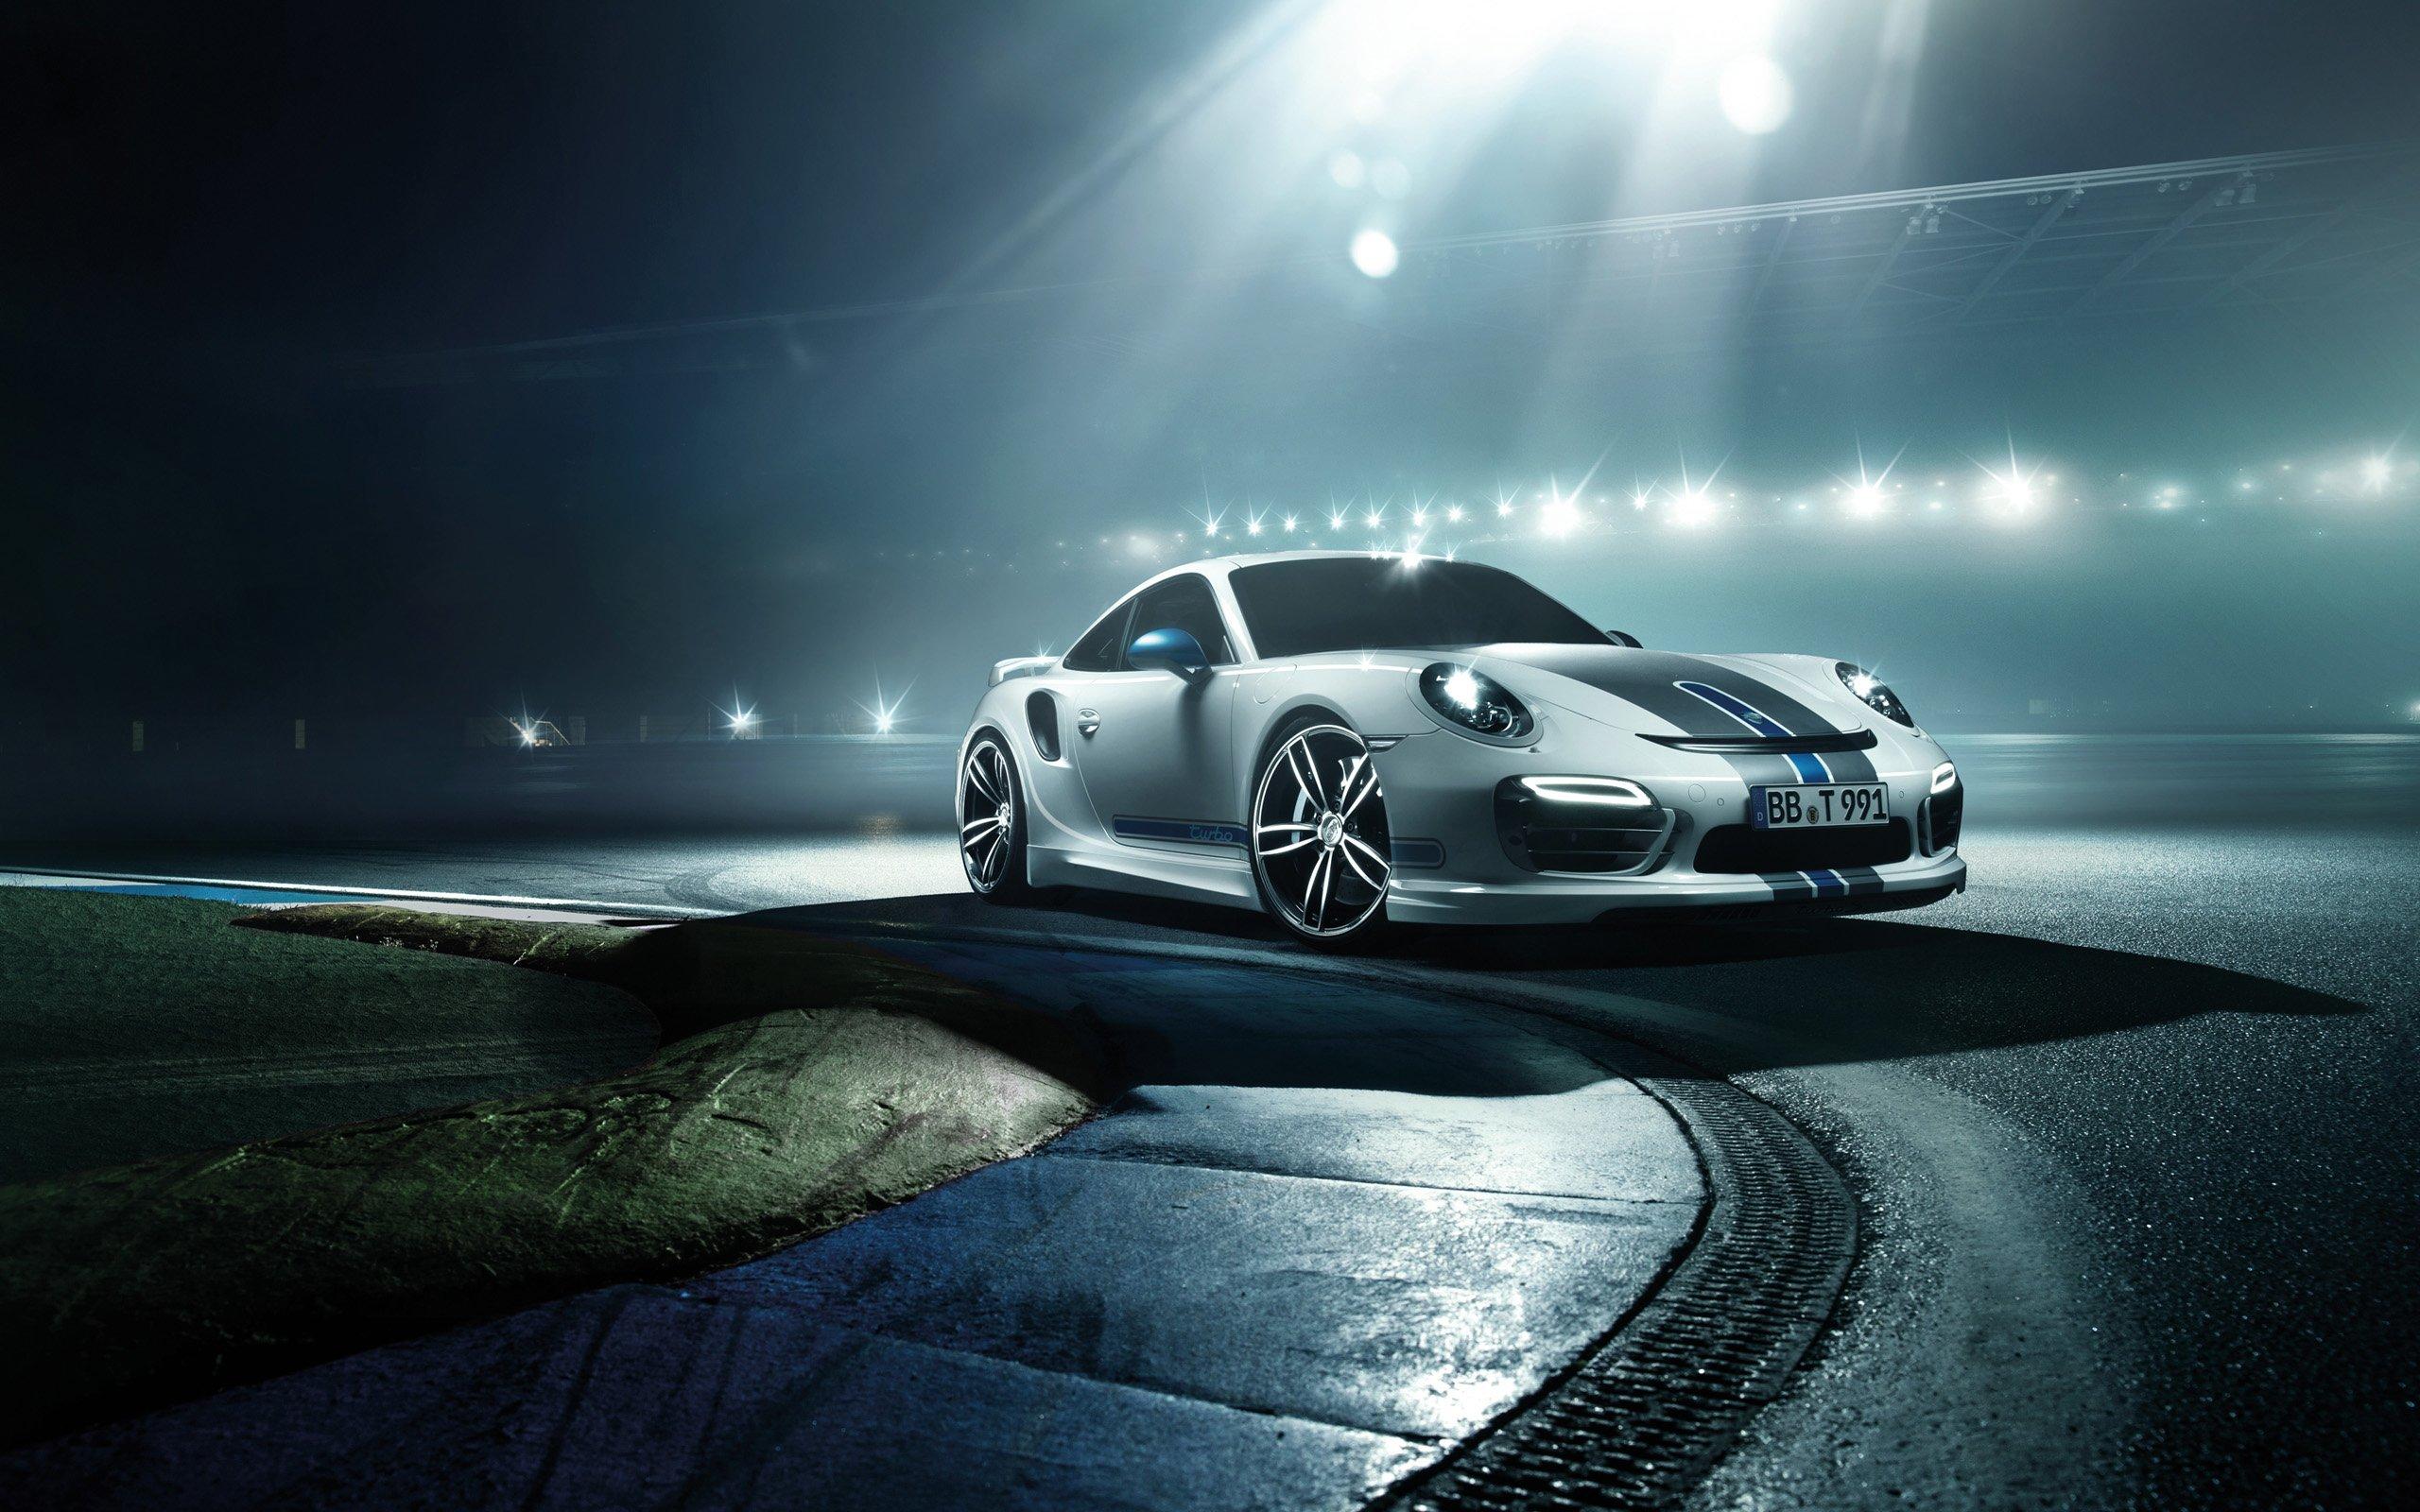 2014 porsche 911 turbo by techart wallpapers hd wallpapers - 2015 Porsche 911 Turbo Wallpaper